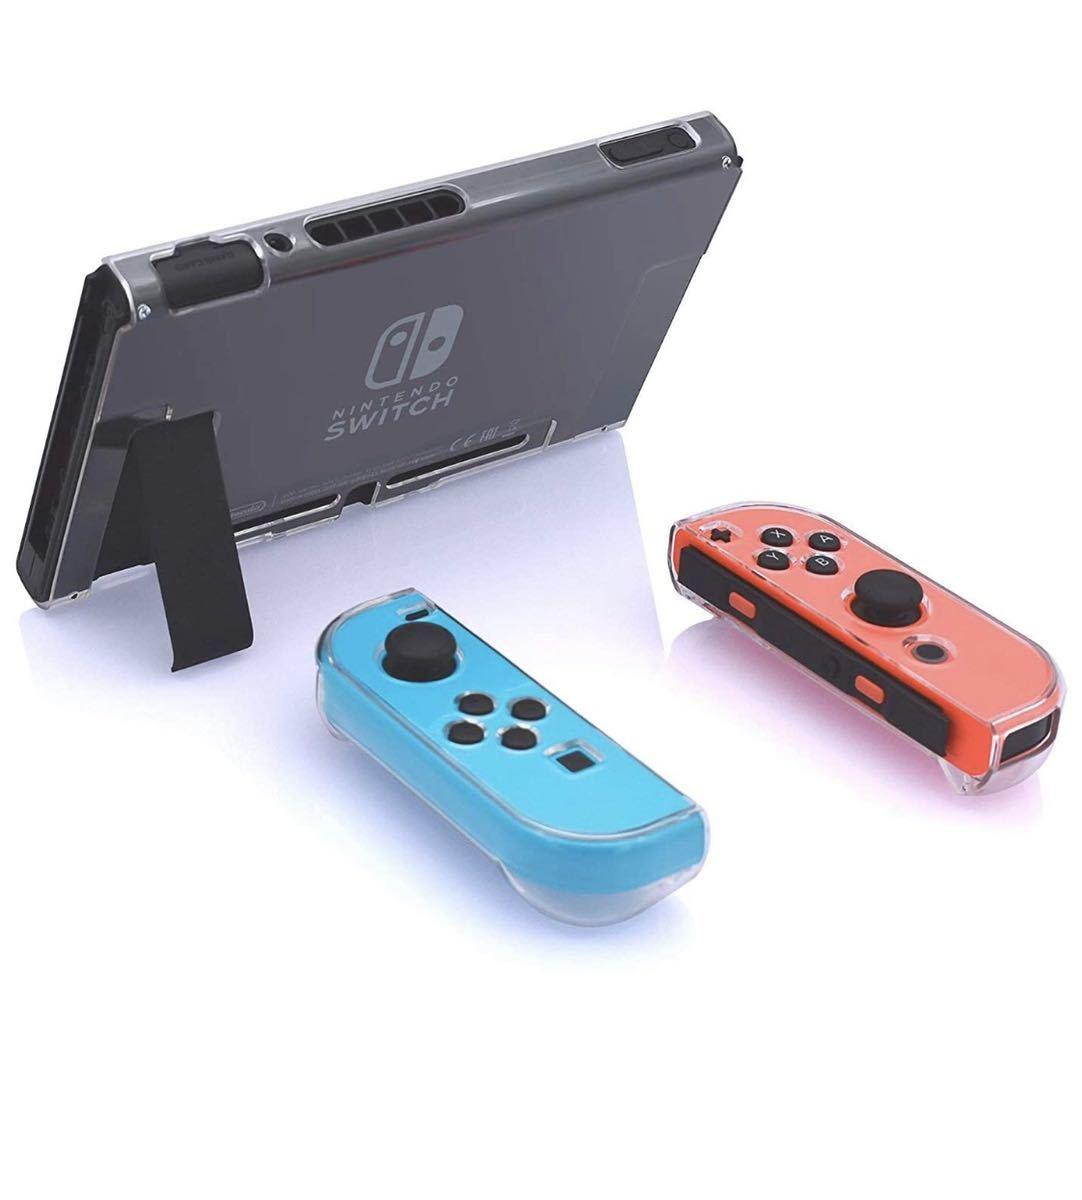 Nintendo Switch用カバー クリアケース 専用カバー Joy-Conカバー 分体式 超薄型 ドッキング可能 任天堂スイッチケース